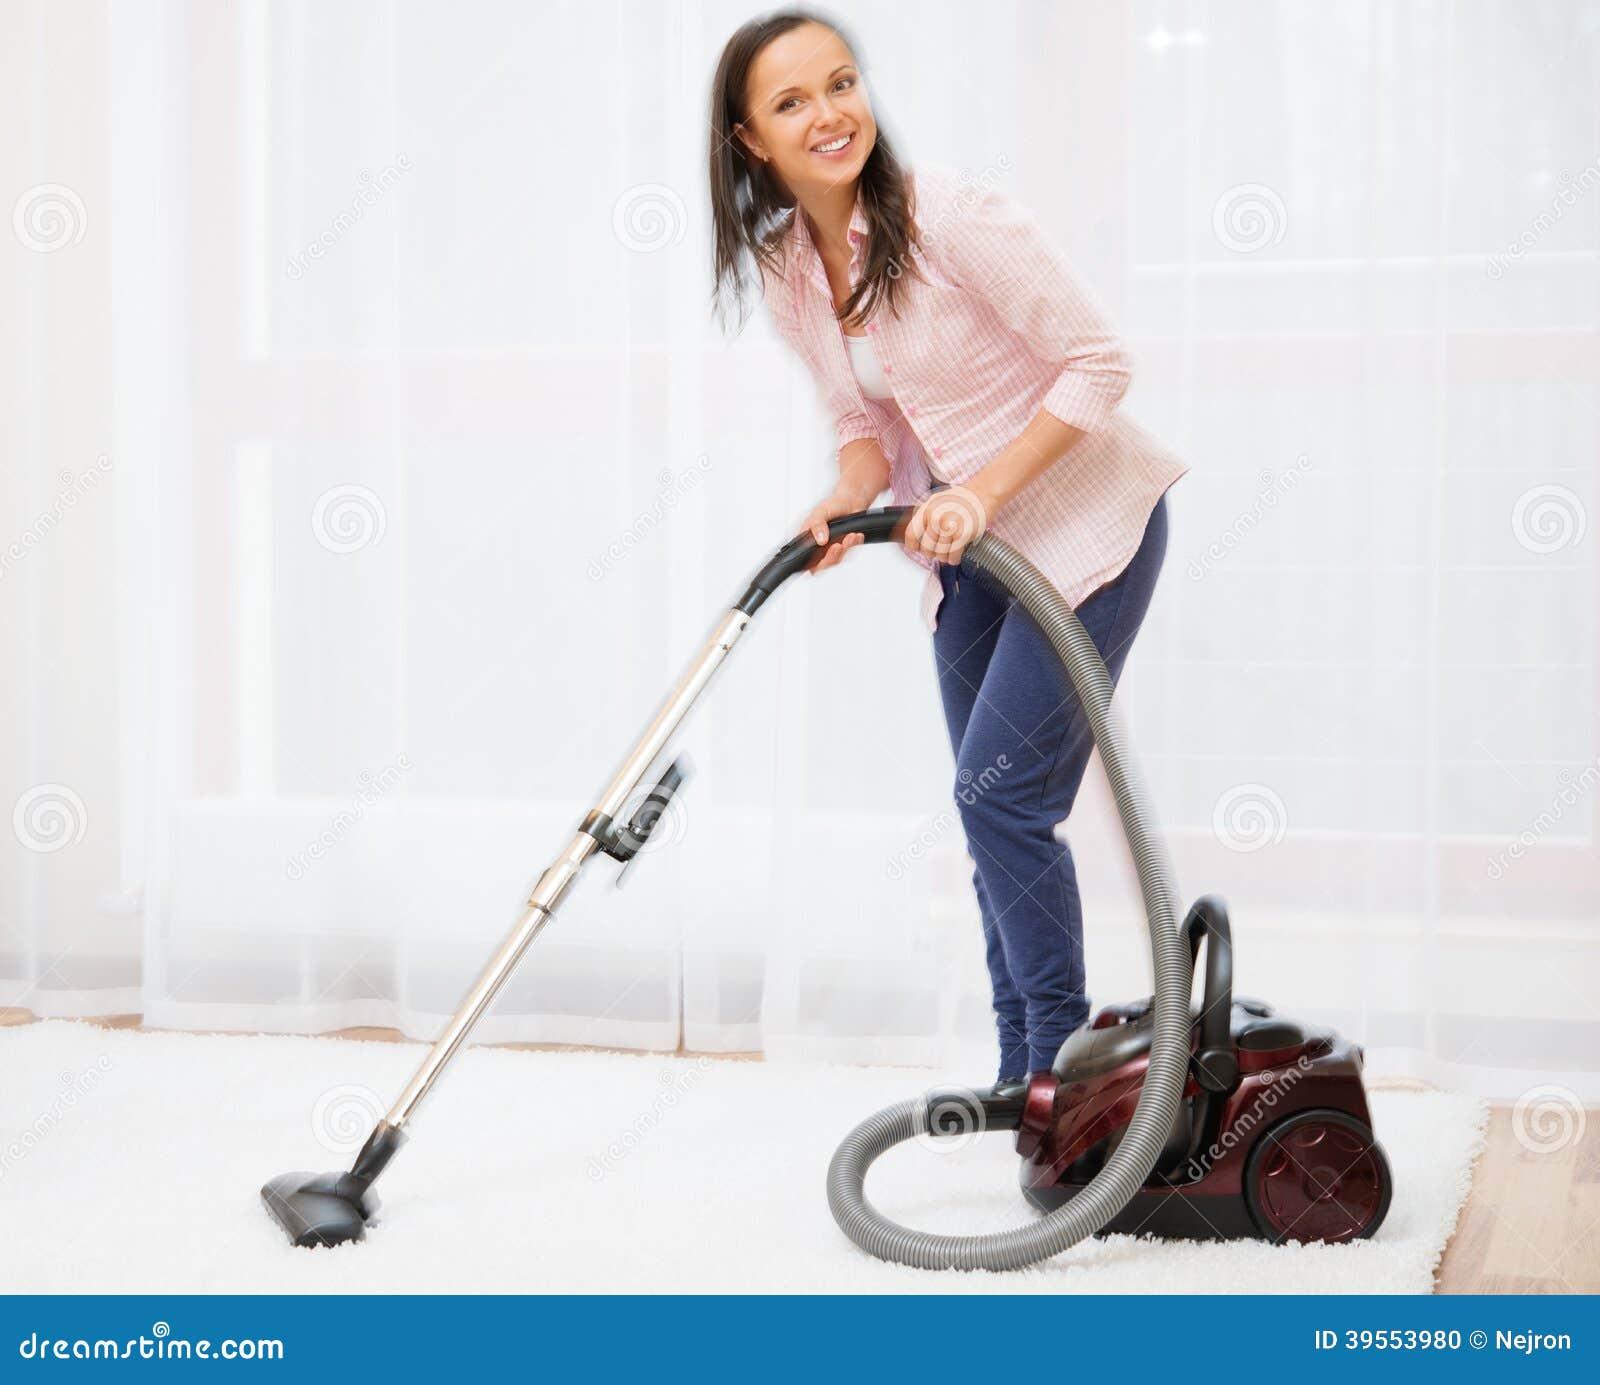 Woman Vacuum Cleaning Carpet Stock Photo Image 39553980